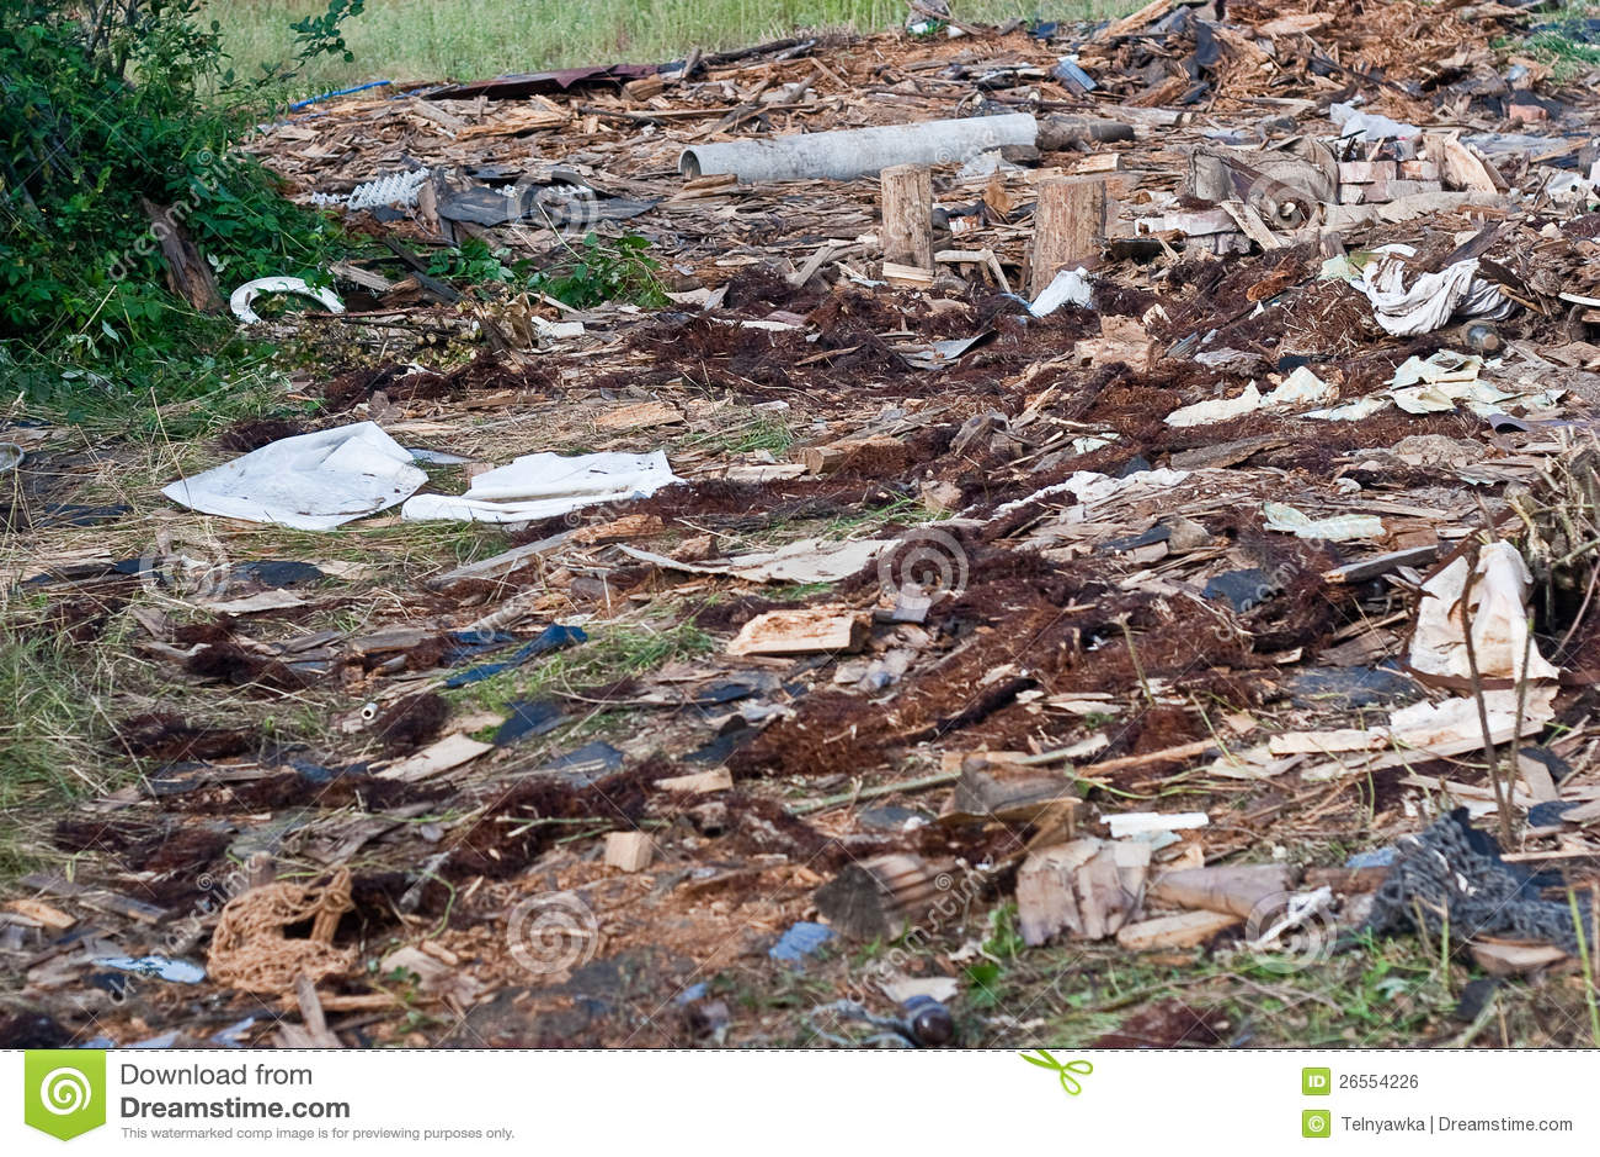 Pile Of Building Debris : A pile of debris royalty free stock image